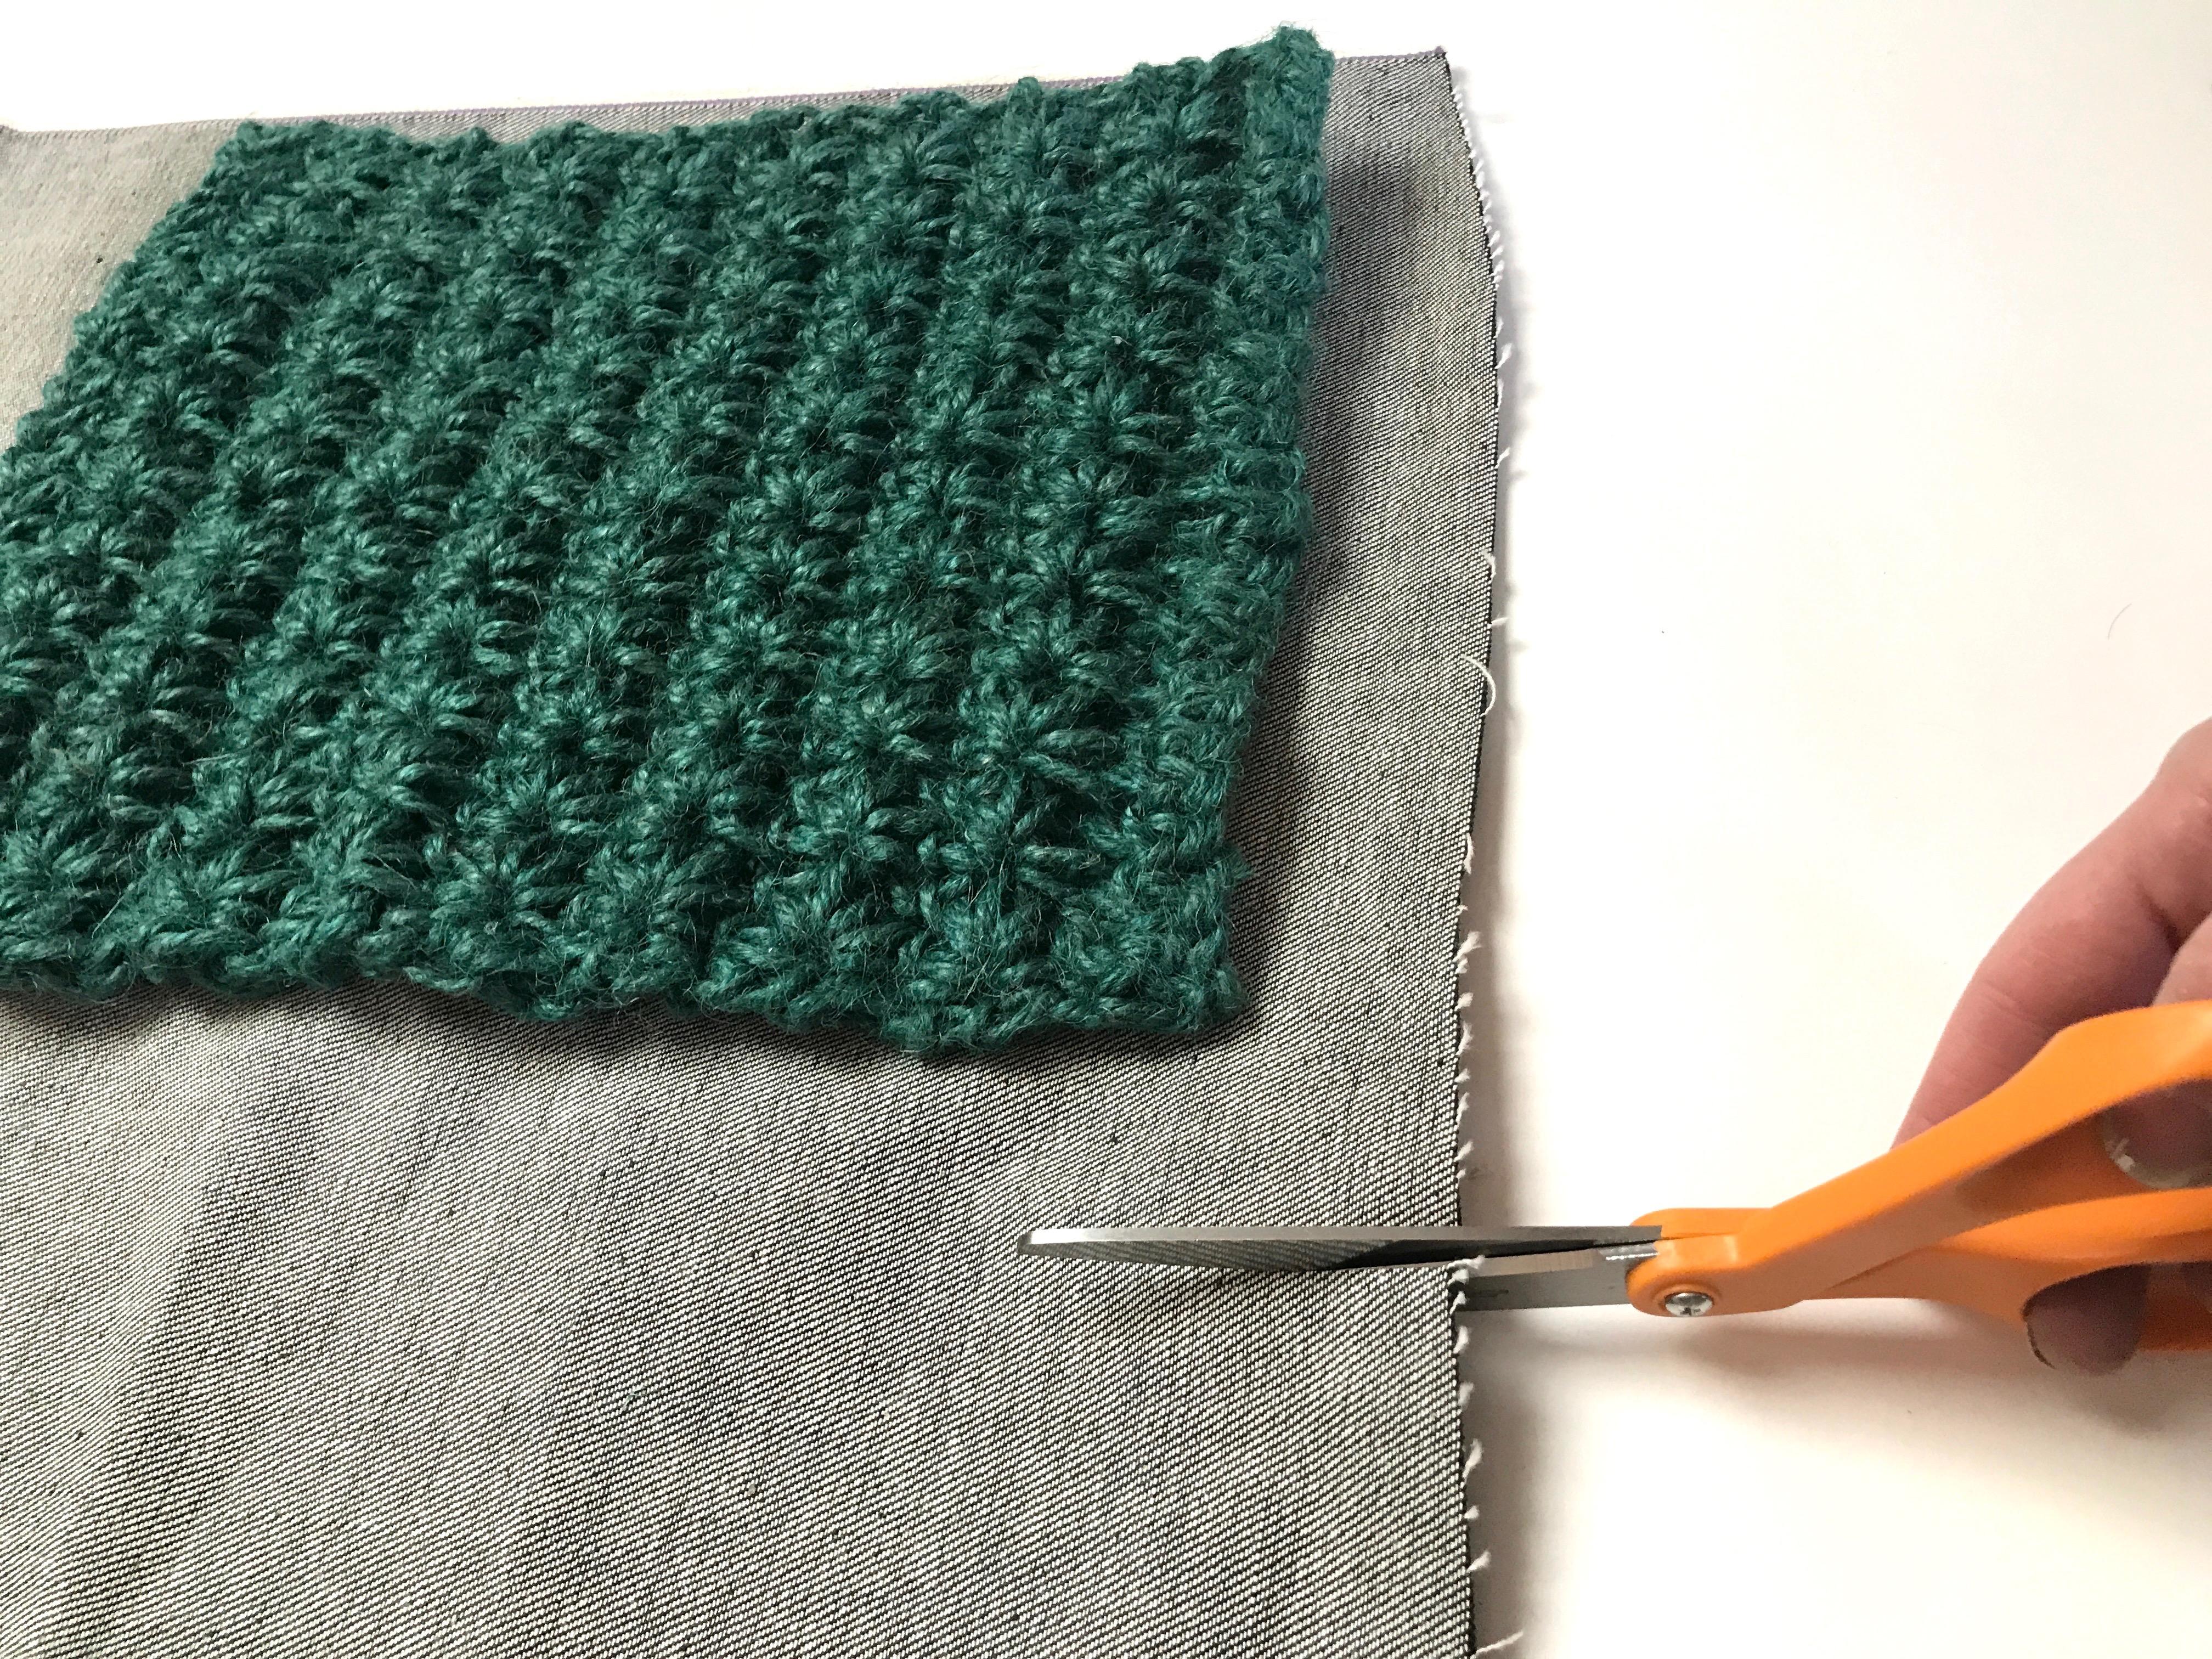 3 Twine handbag crochet Cutting denim lining fiskars myfixituplife